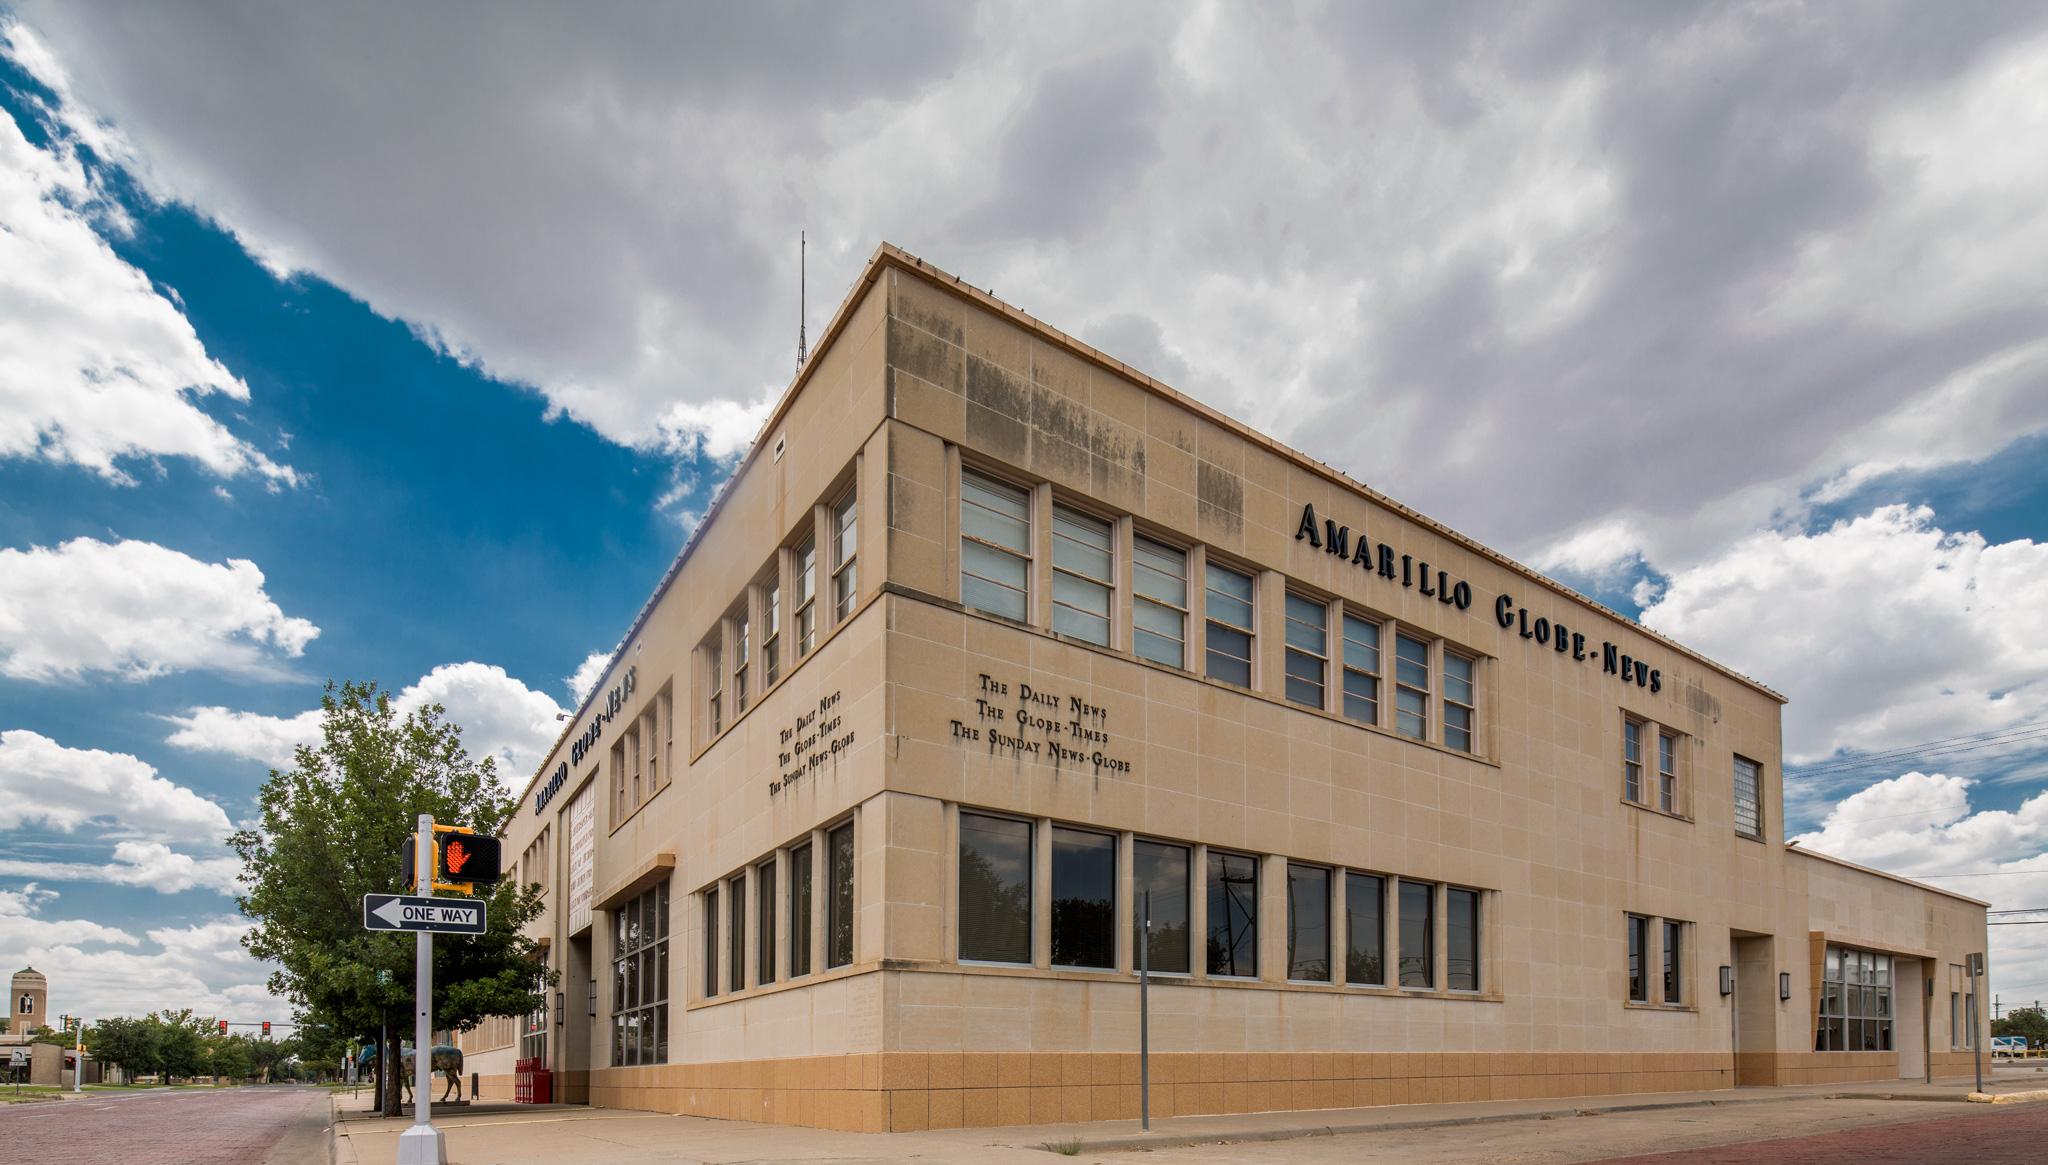 Amarillo-Globe-News.jpg